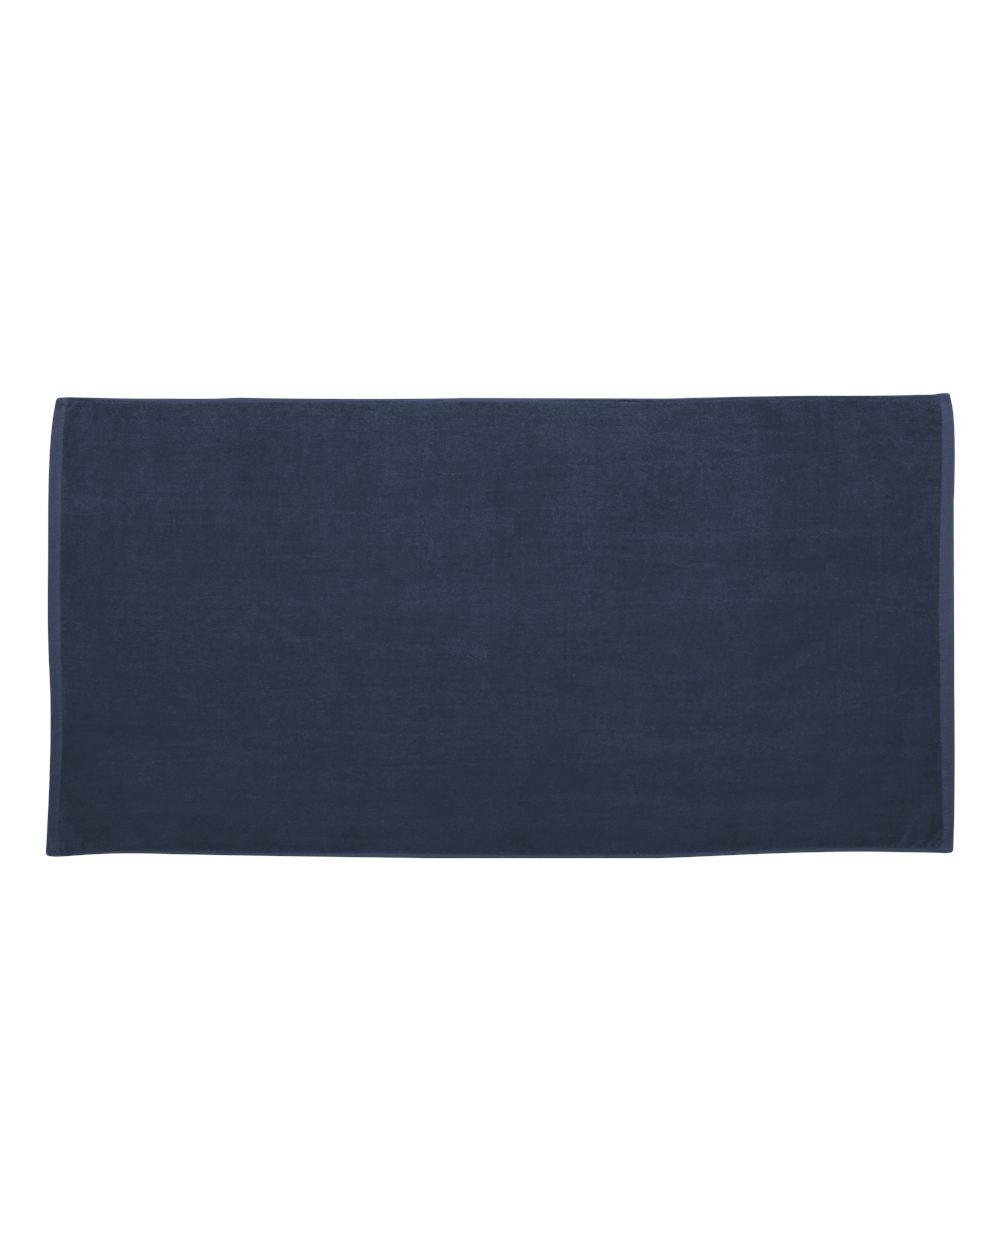 Carmel Towel Company 3060 - Velour Beach Towe